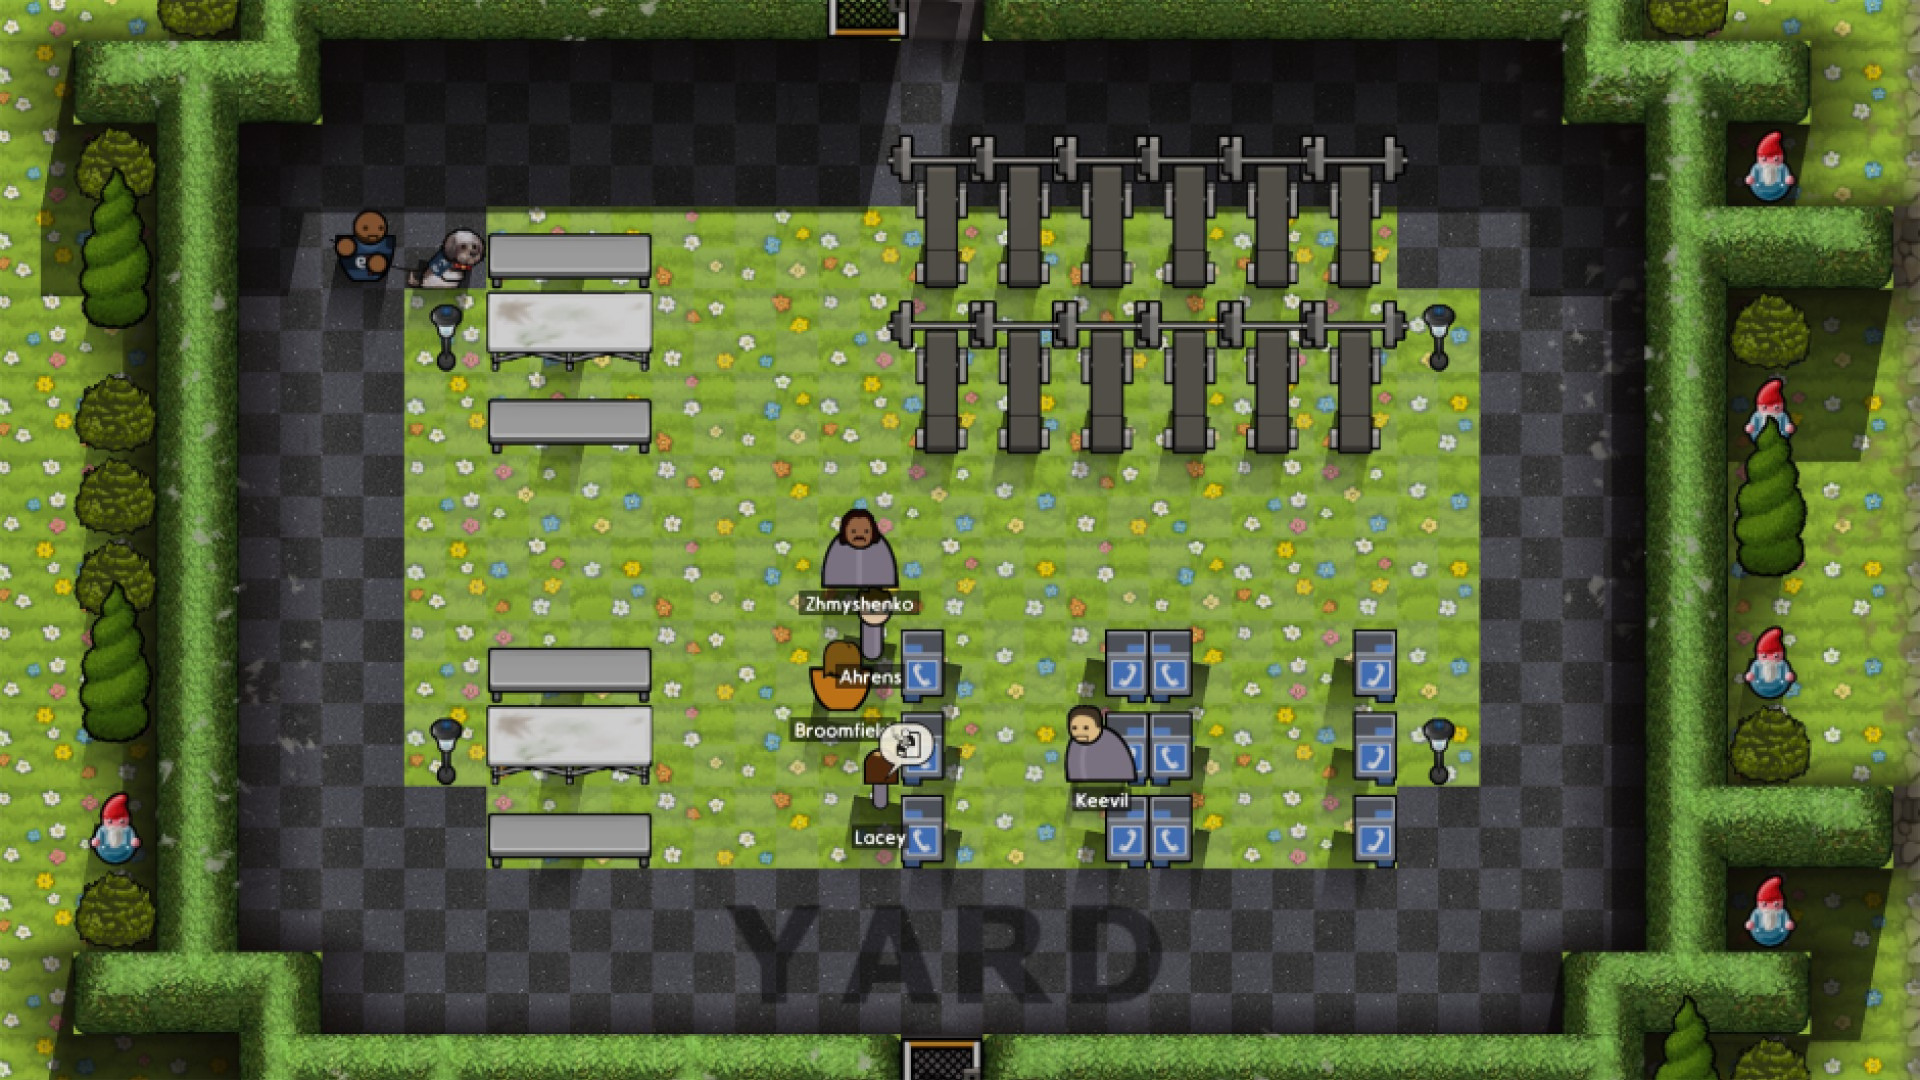 Prison architect: going green